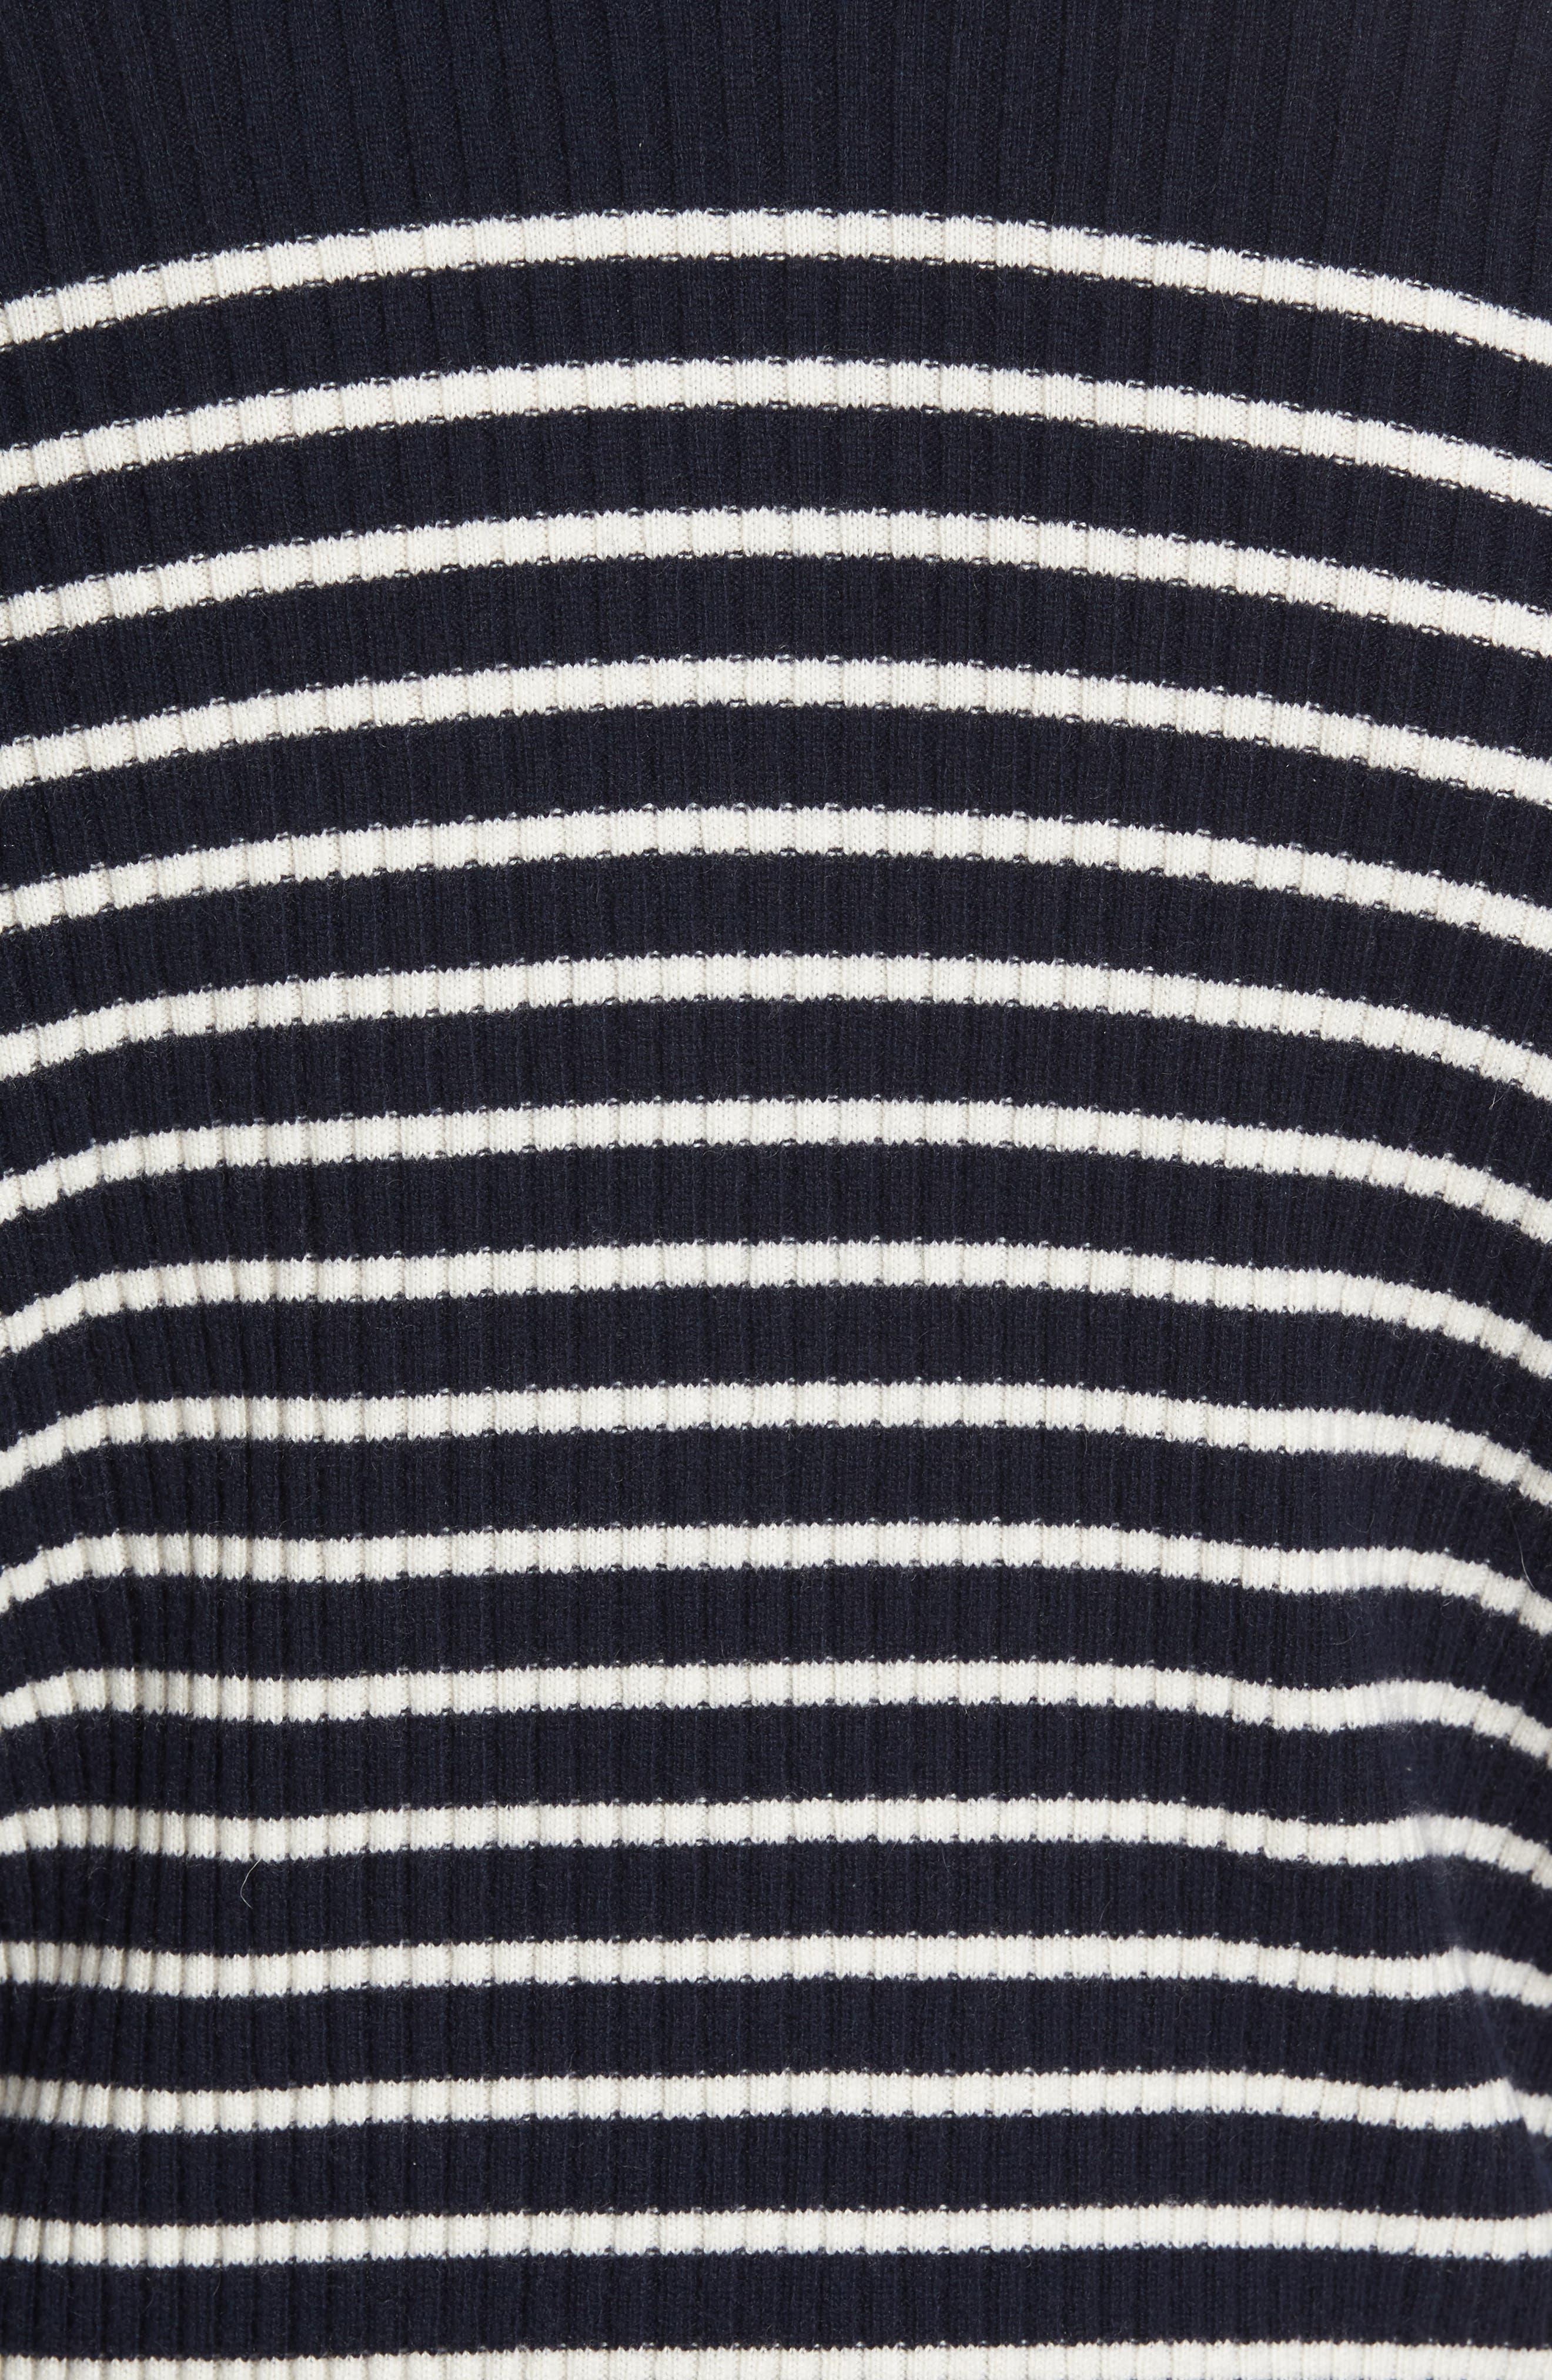 Regular Fit Breton Stripe Cashmere Turtleneck Sweater,                             Alternate thumbnail 10, color,